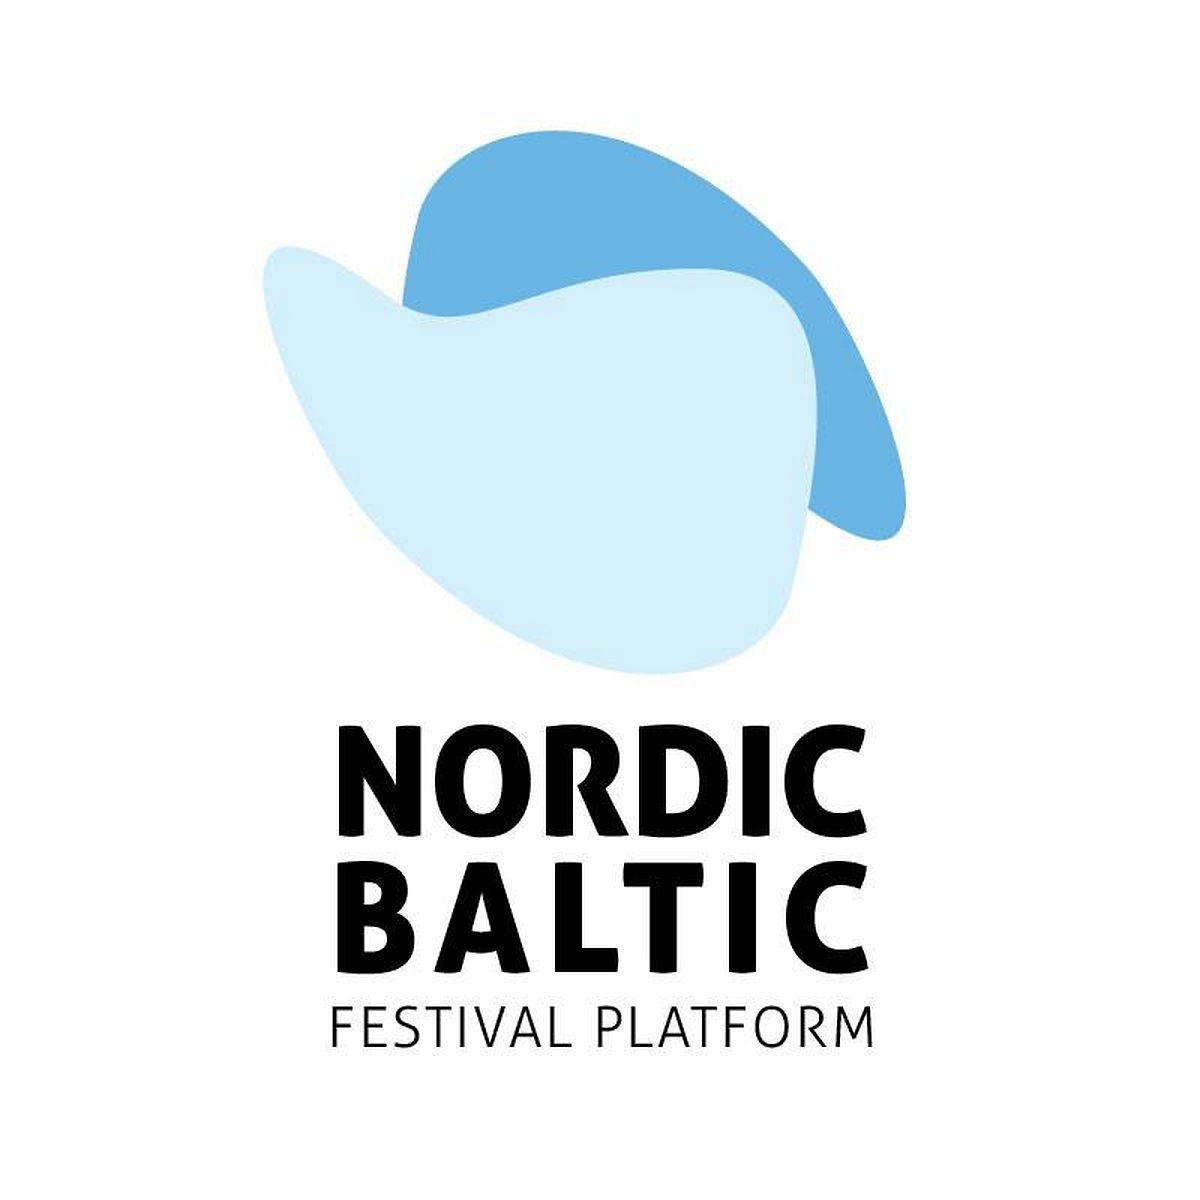 NordicBaltic Festival Platform